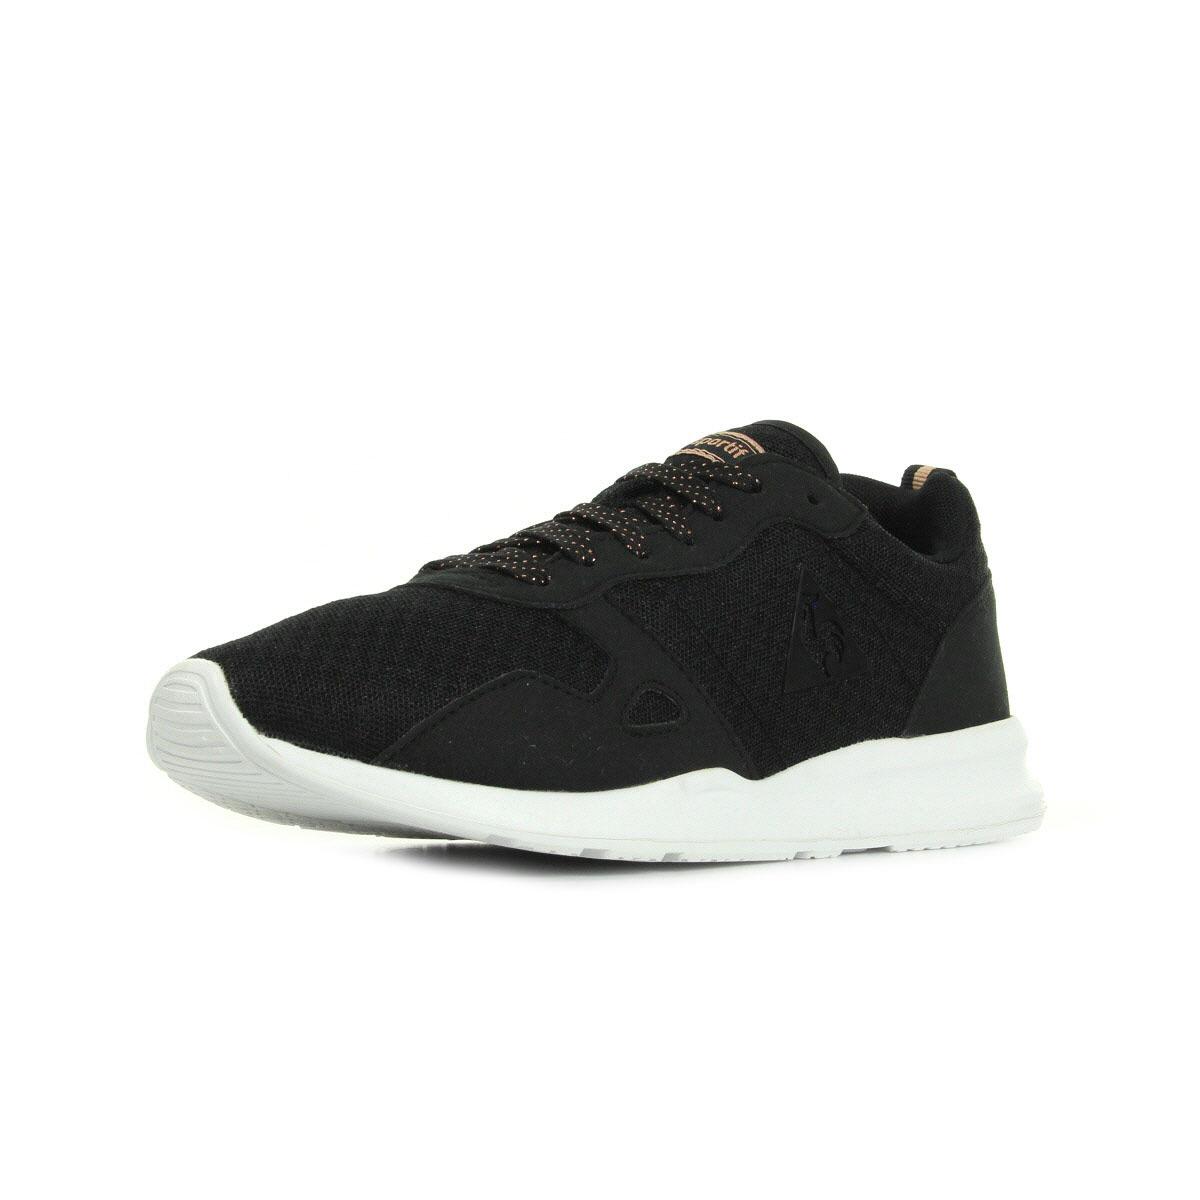 Le Coq Sportif Lcs R600 W Summer Feminine Mesh Black noir - Chaussures Basket Femme